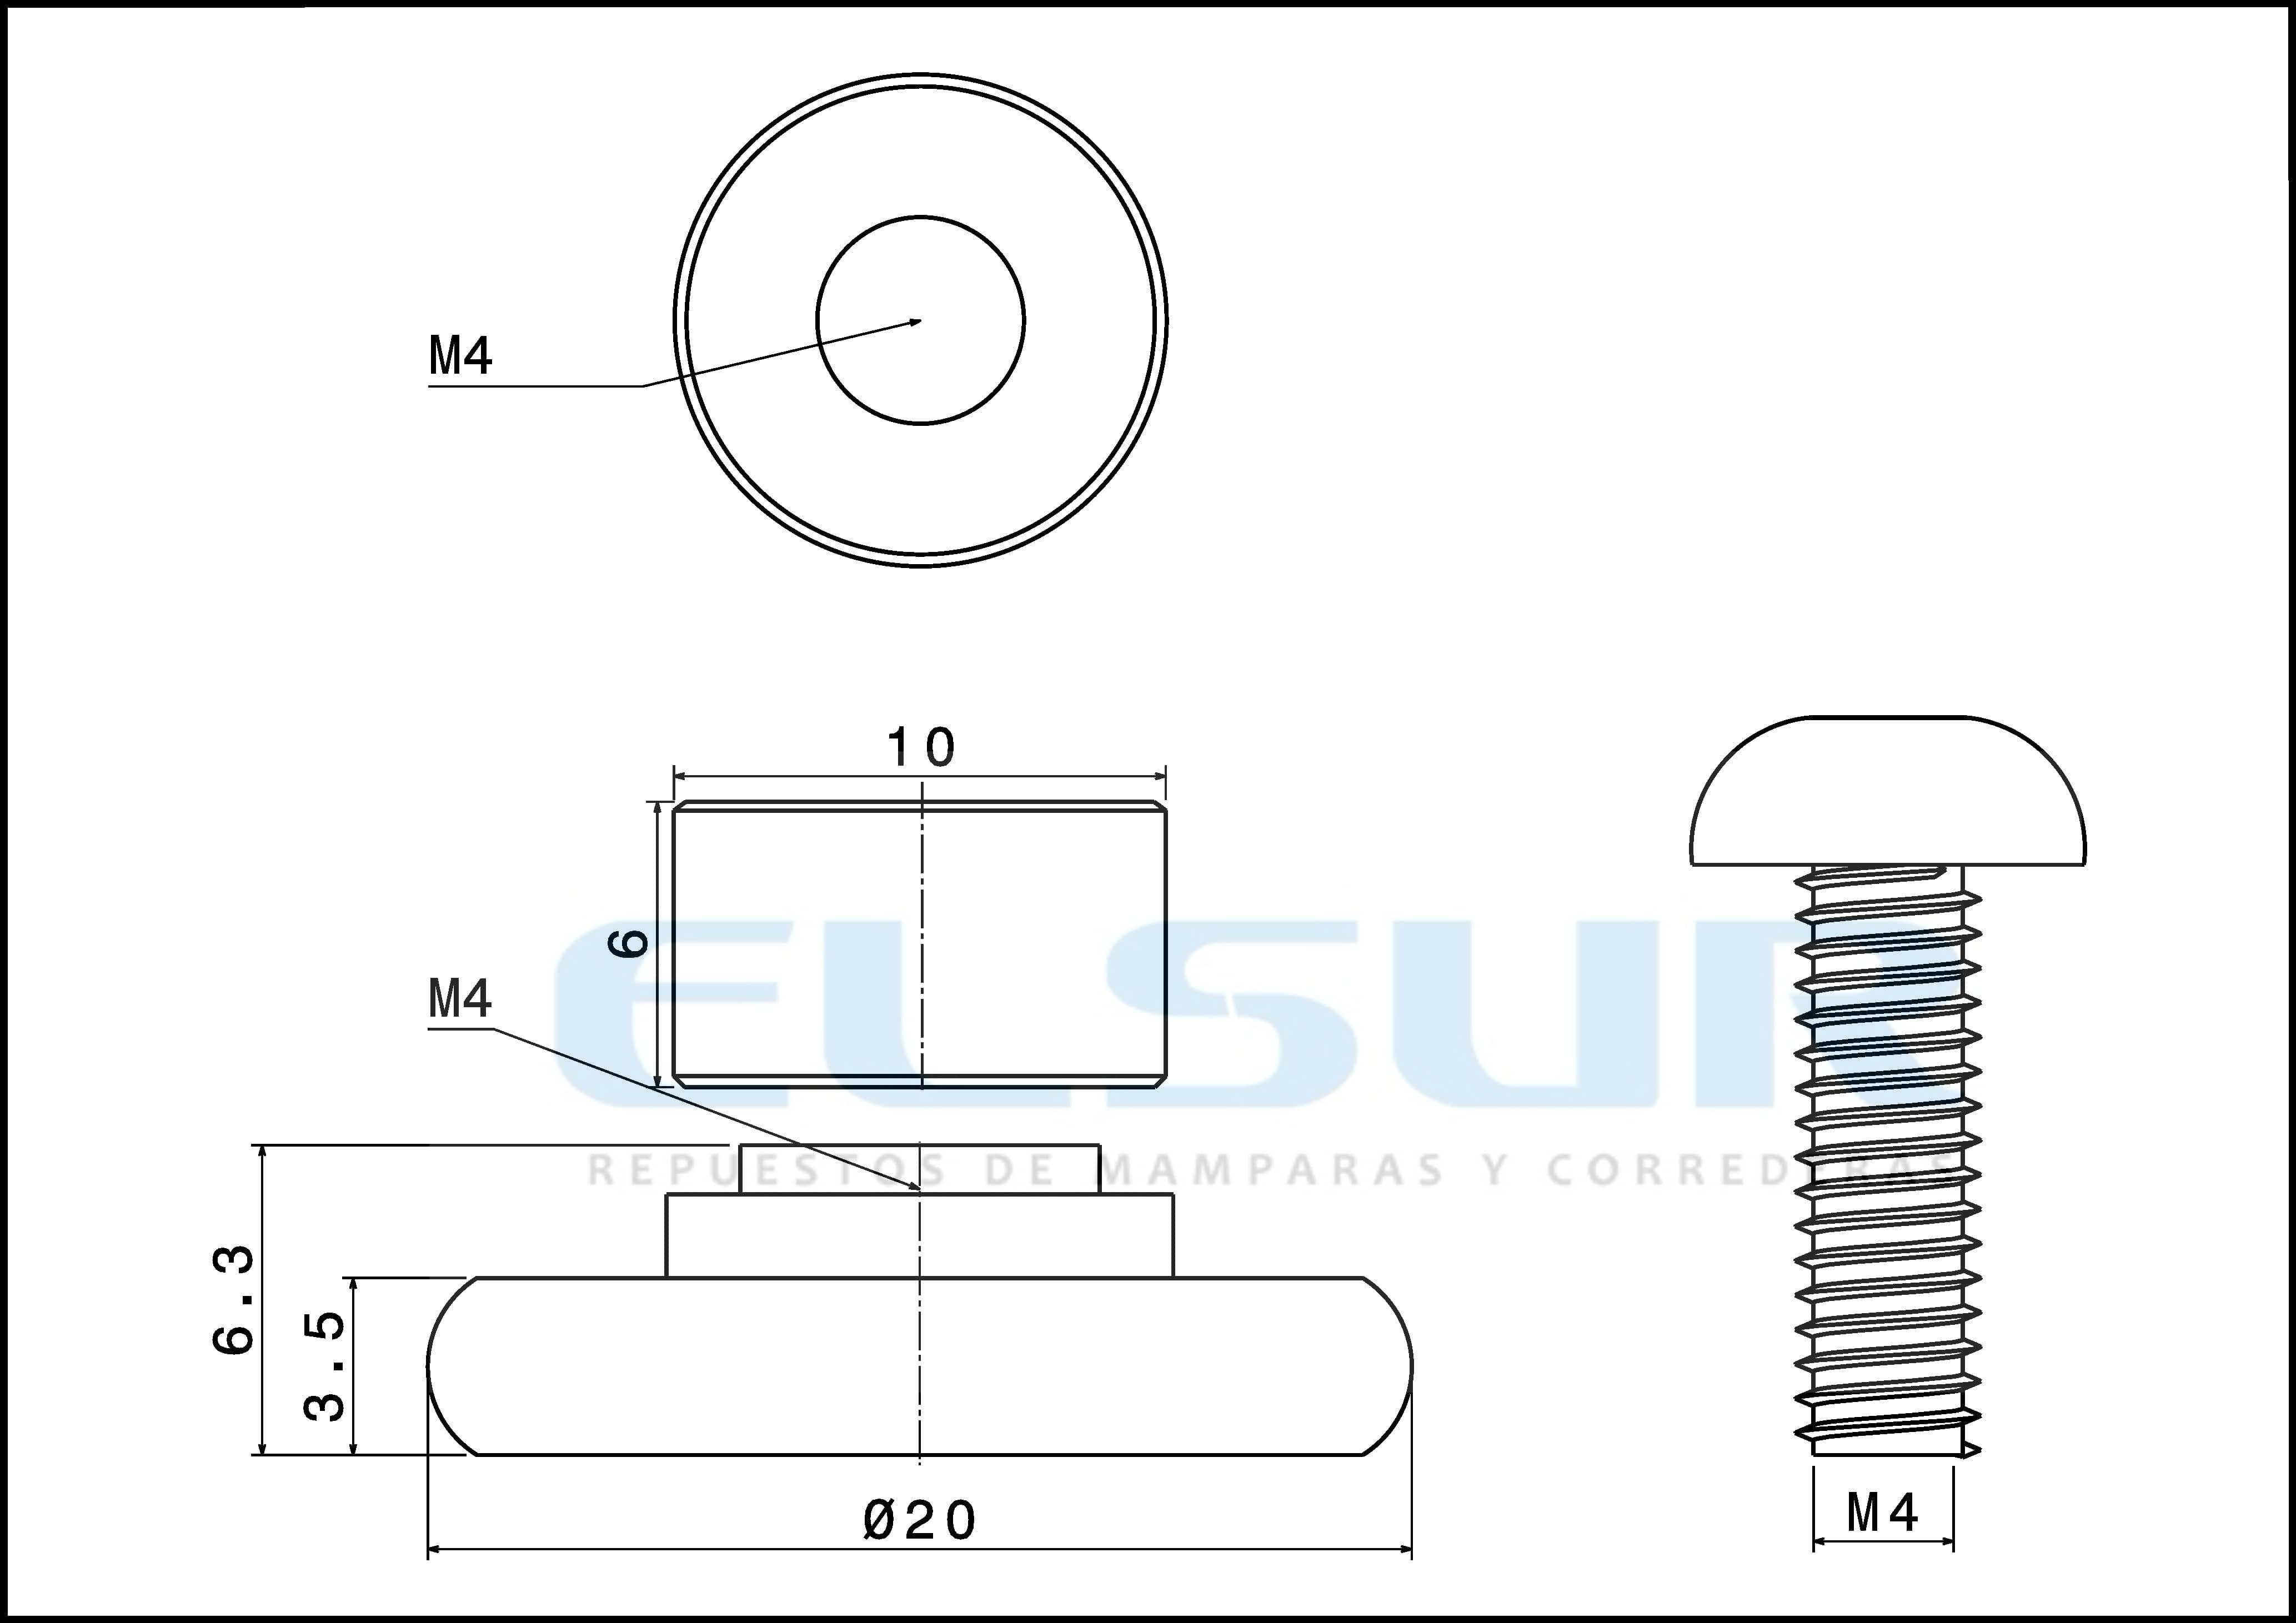 Rodamiento frontal 20 mm nylon casquillo 6mm